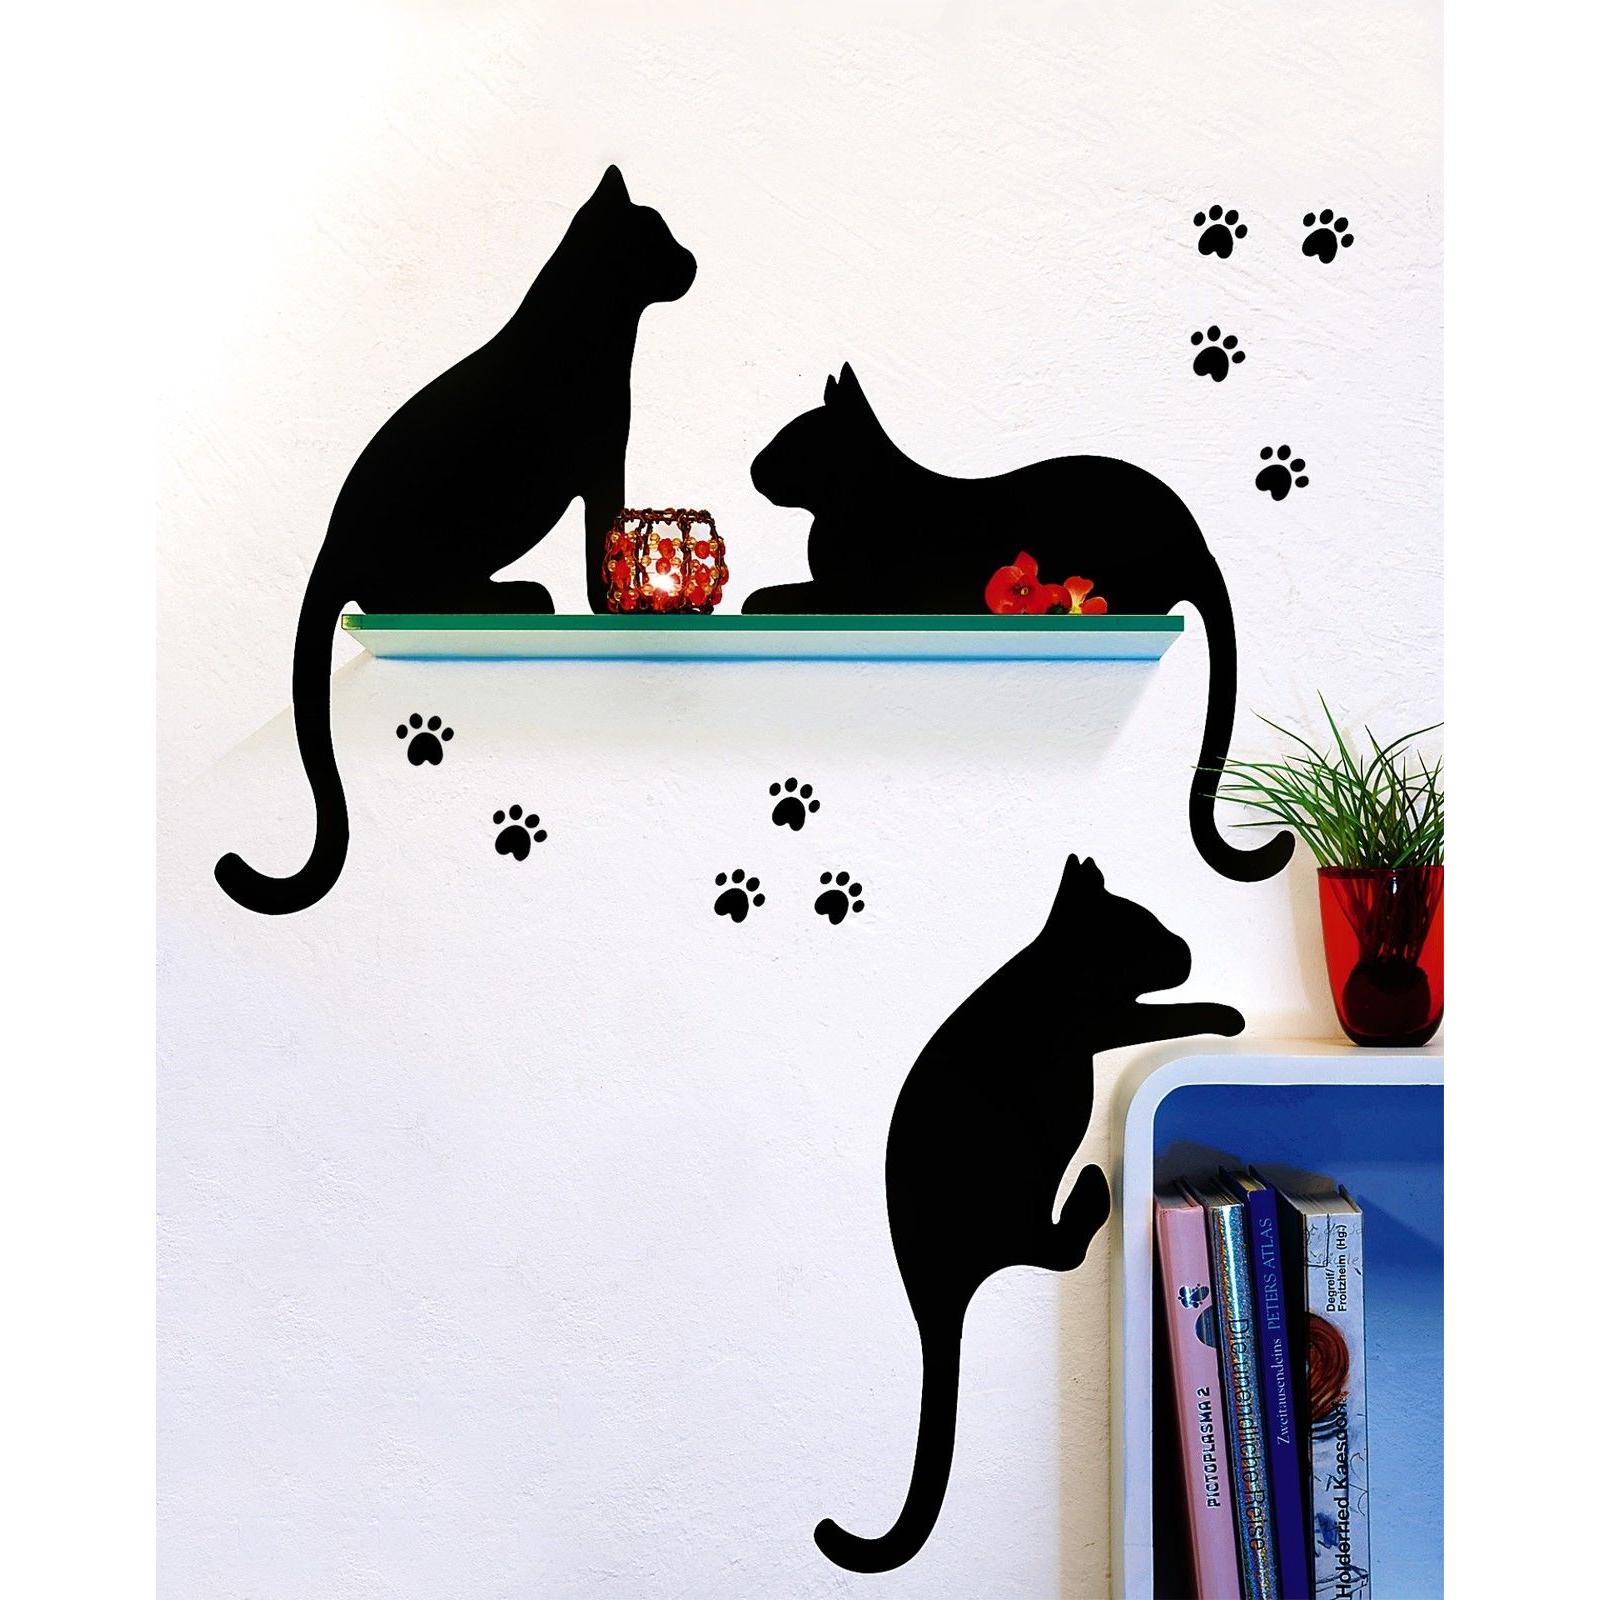 Bezaubernd Wandtattoo Katzen Ideen Von 3 Schwarze Wand Sticker Kühlschrank Deko Aufkleber